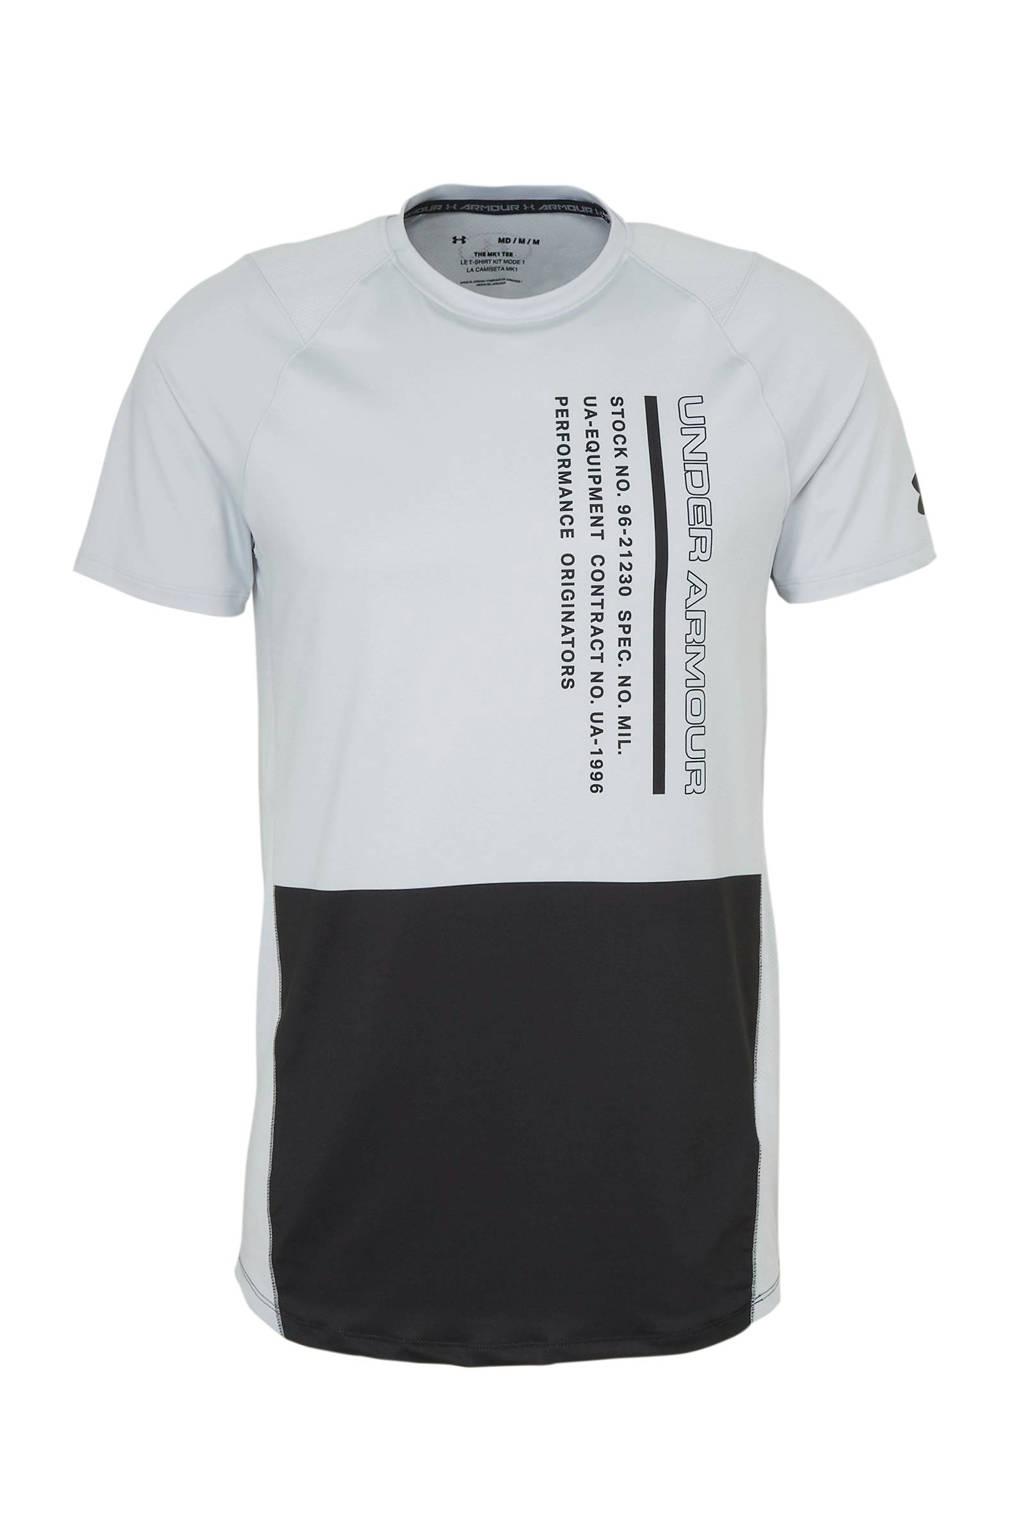 Under Armour   T-shirt lichtgrijs, Lichtgrijs/zwart